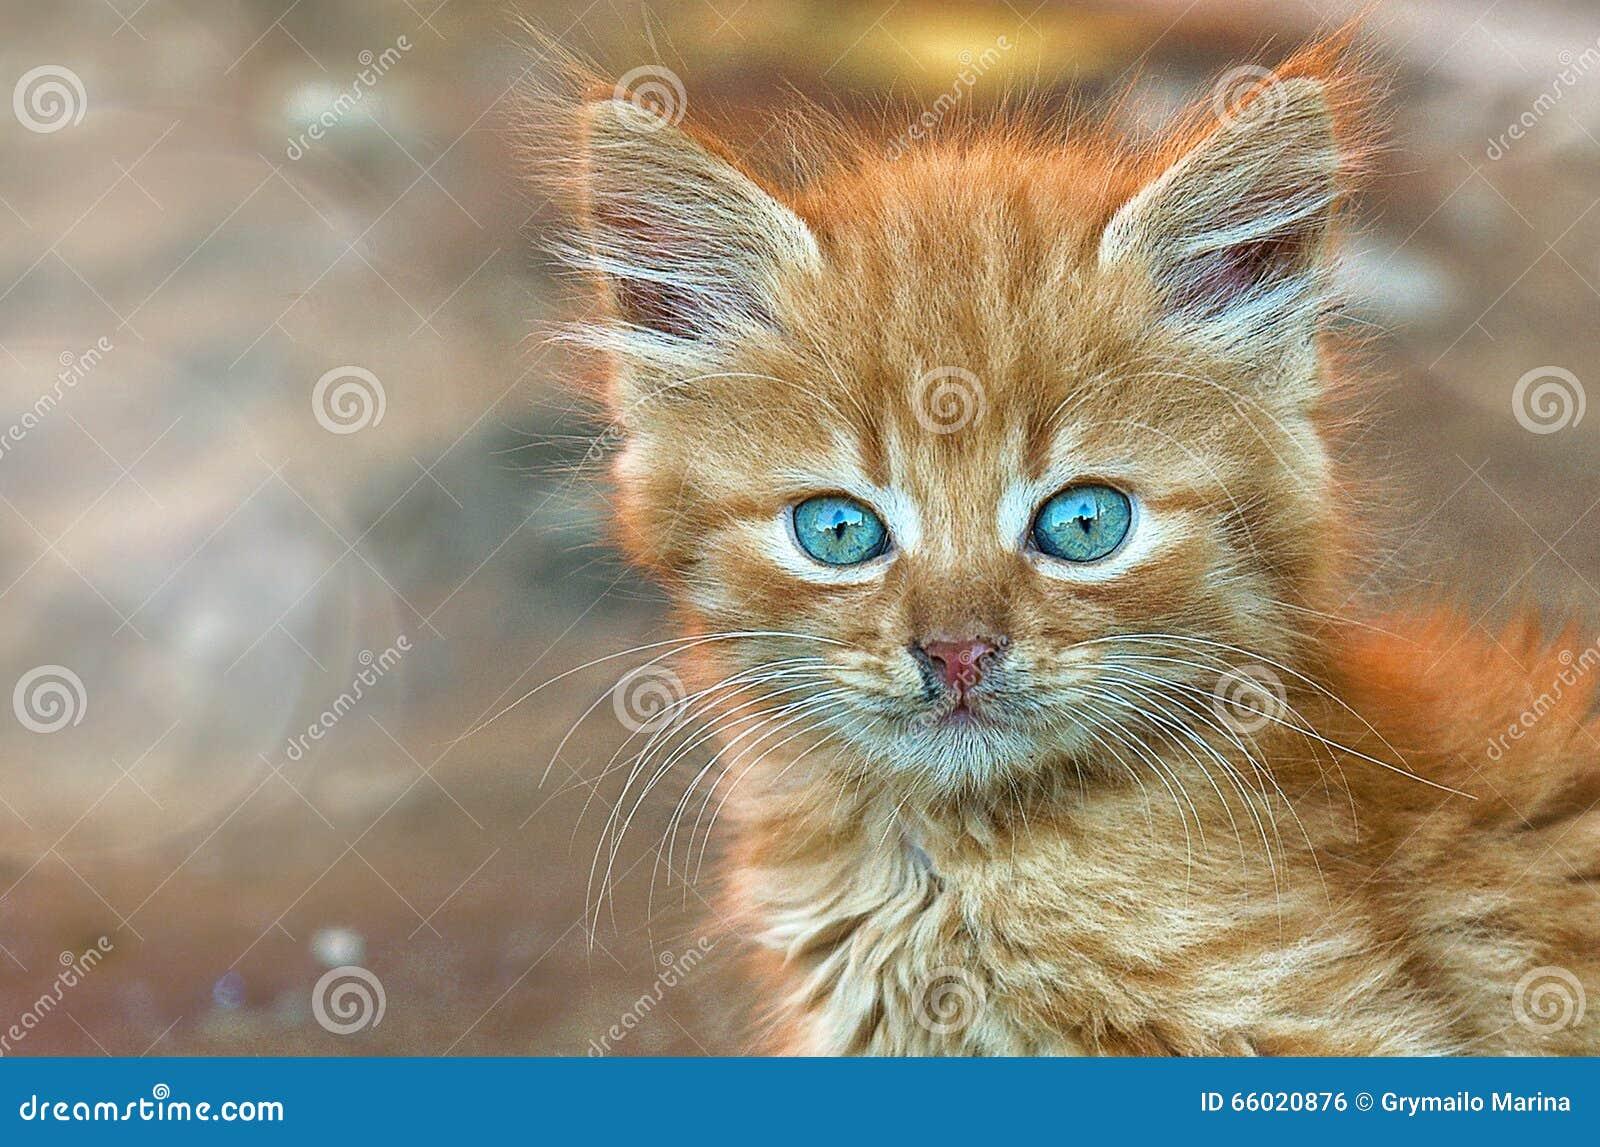 Ginger kitten kitten look little kitty